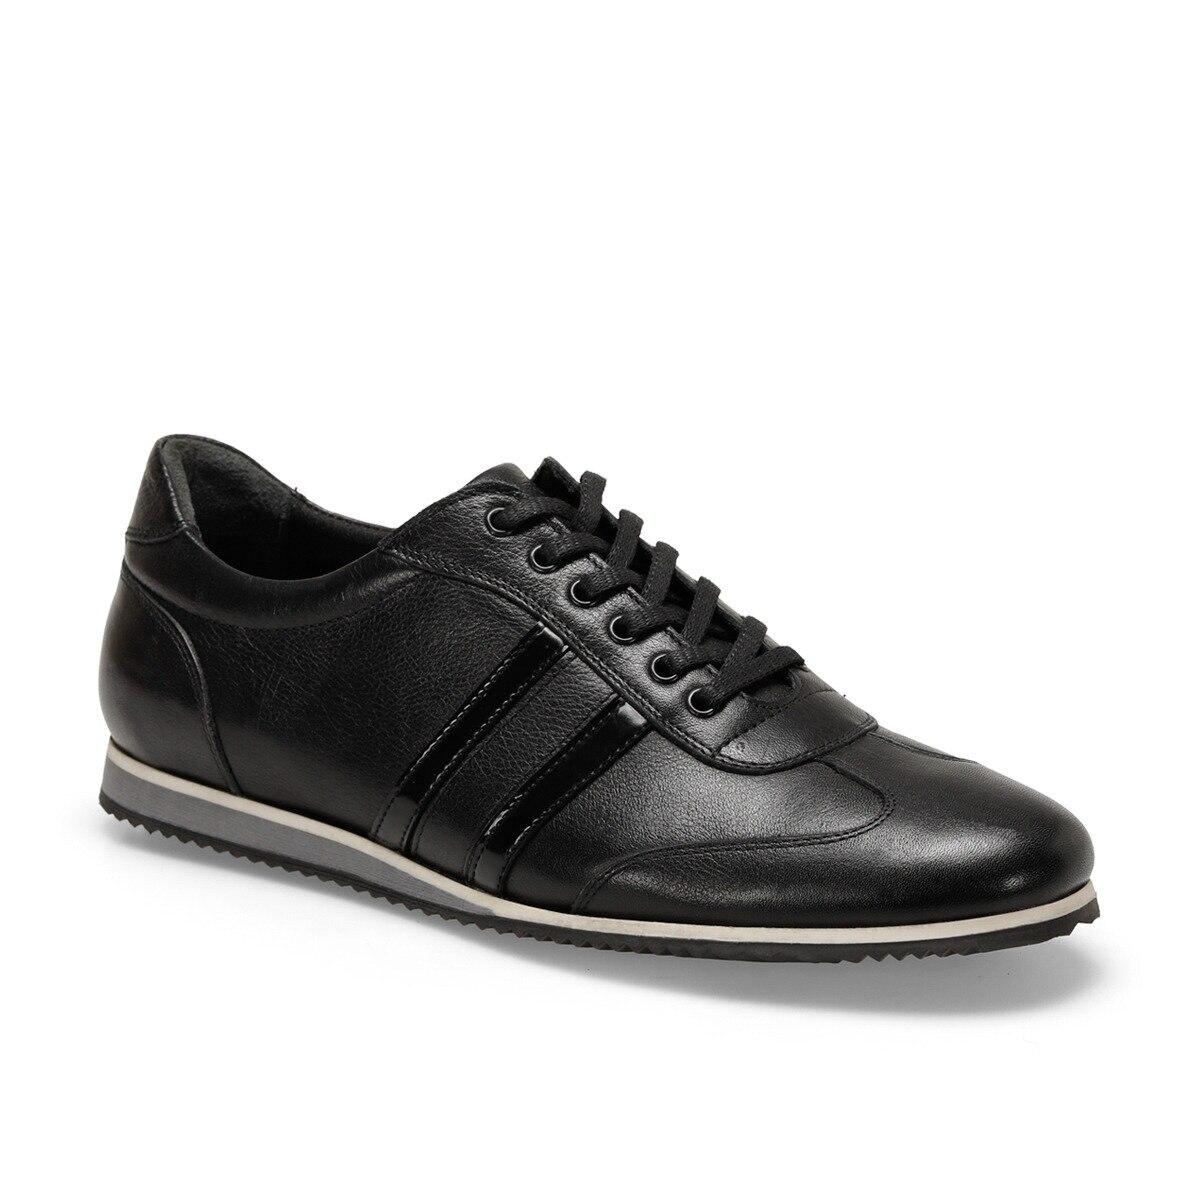 FLO Black Men Casual Shoes Lace-up Men Shoes Comfortable Breathable Walking Sneakers Tenis masculino Zapatillas Hombre Oxide 132 C